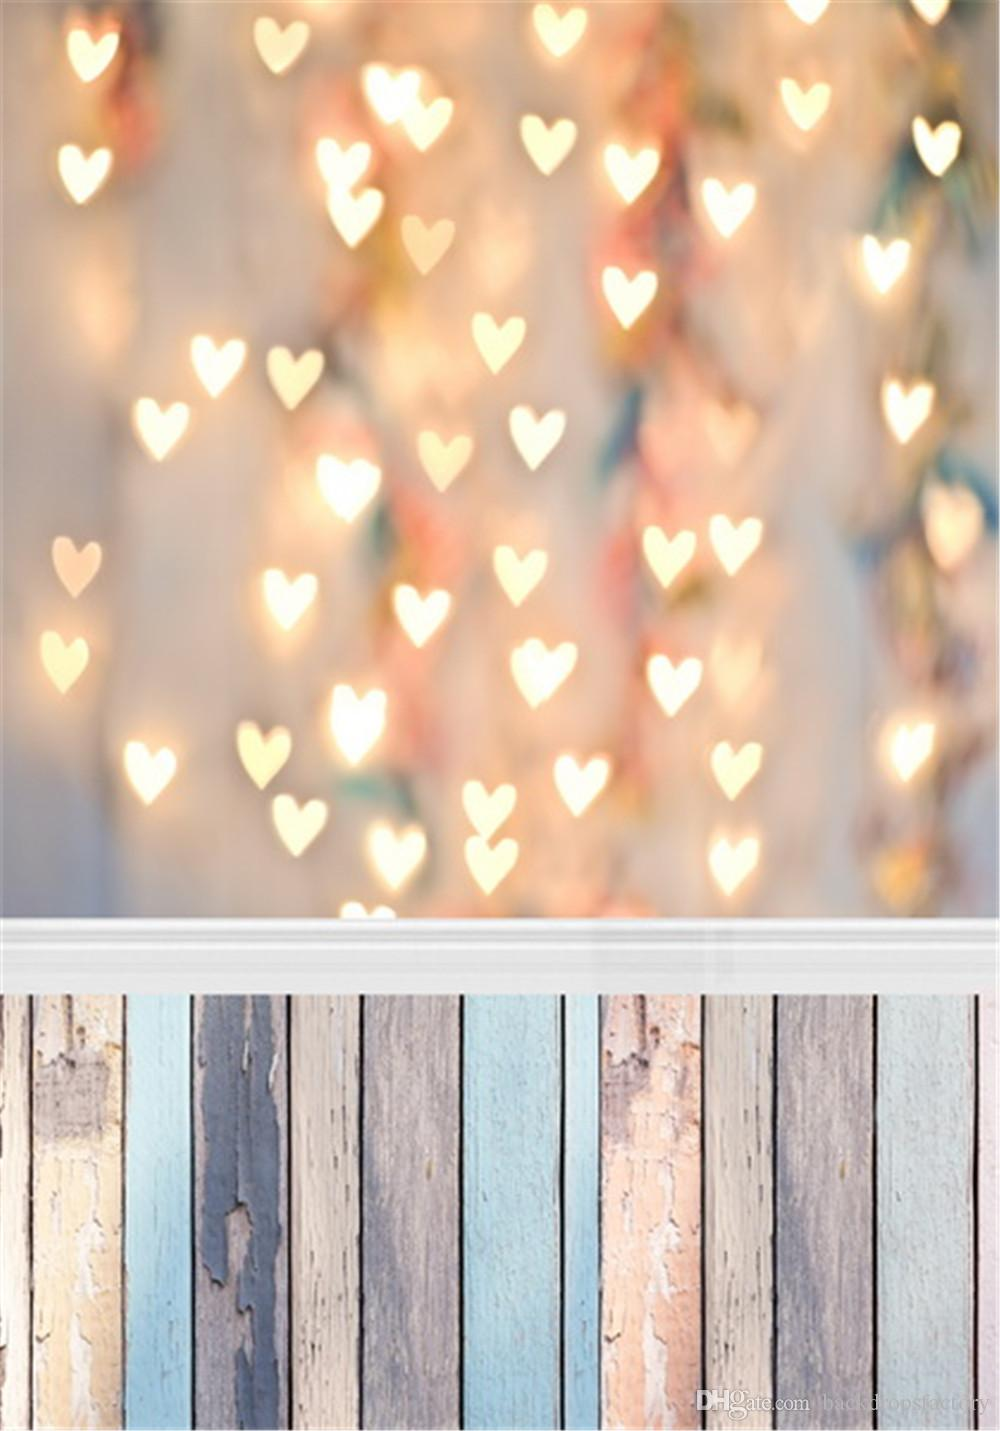 Glitter Love Heart Lights Photography Backdrop Vinyl Wood Planks Texture Floor Photo Background Bokeh Baby Newborn Booth Wallpaper Props